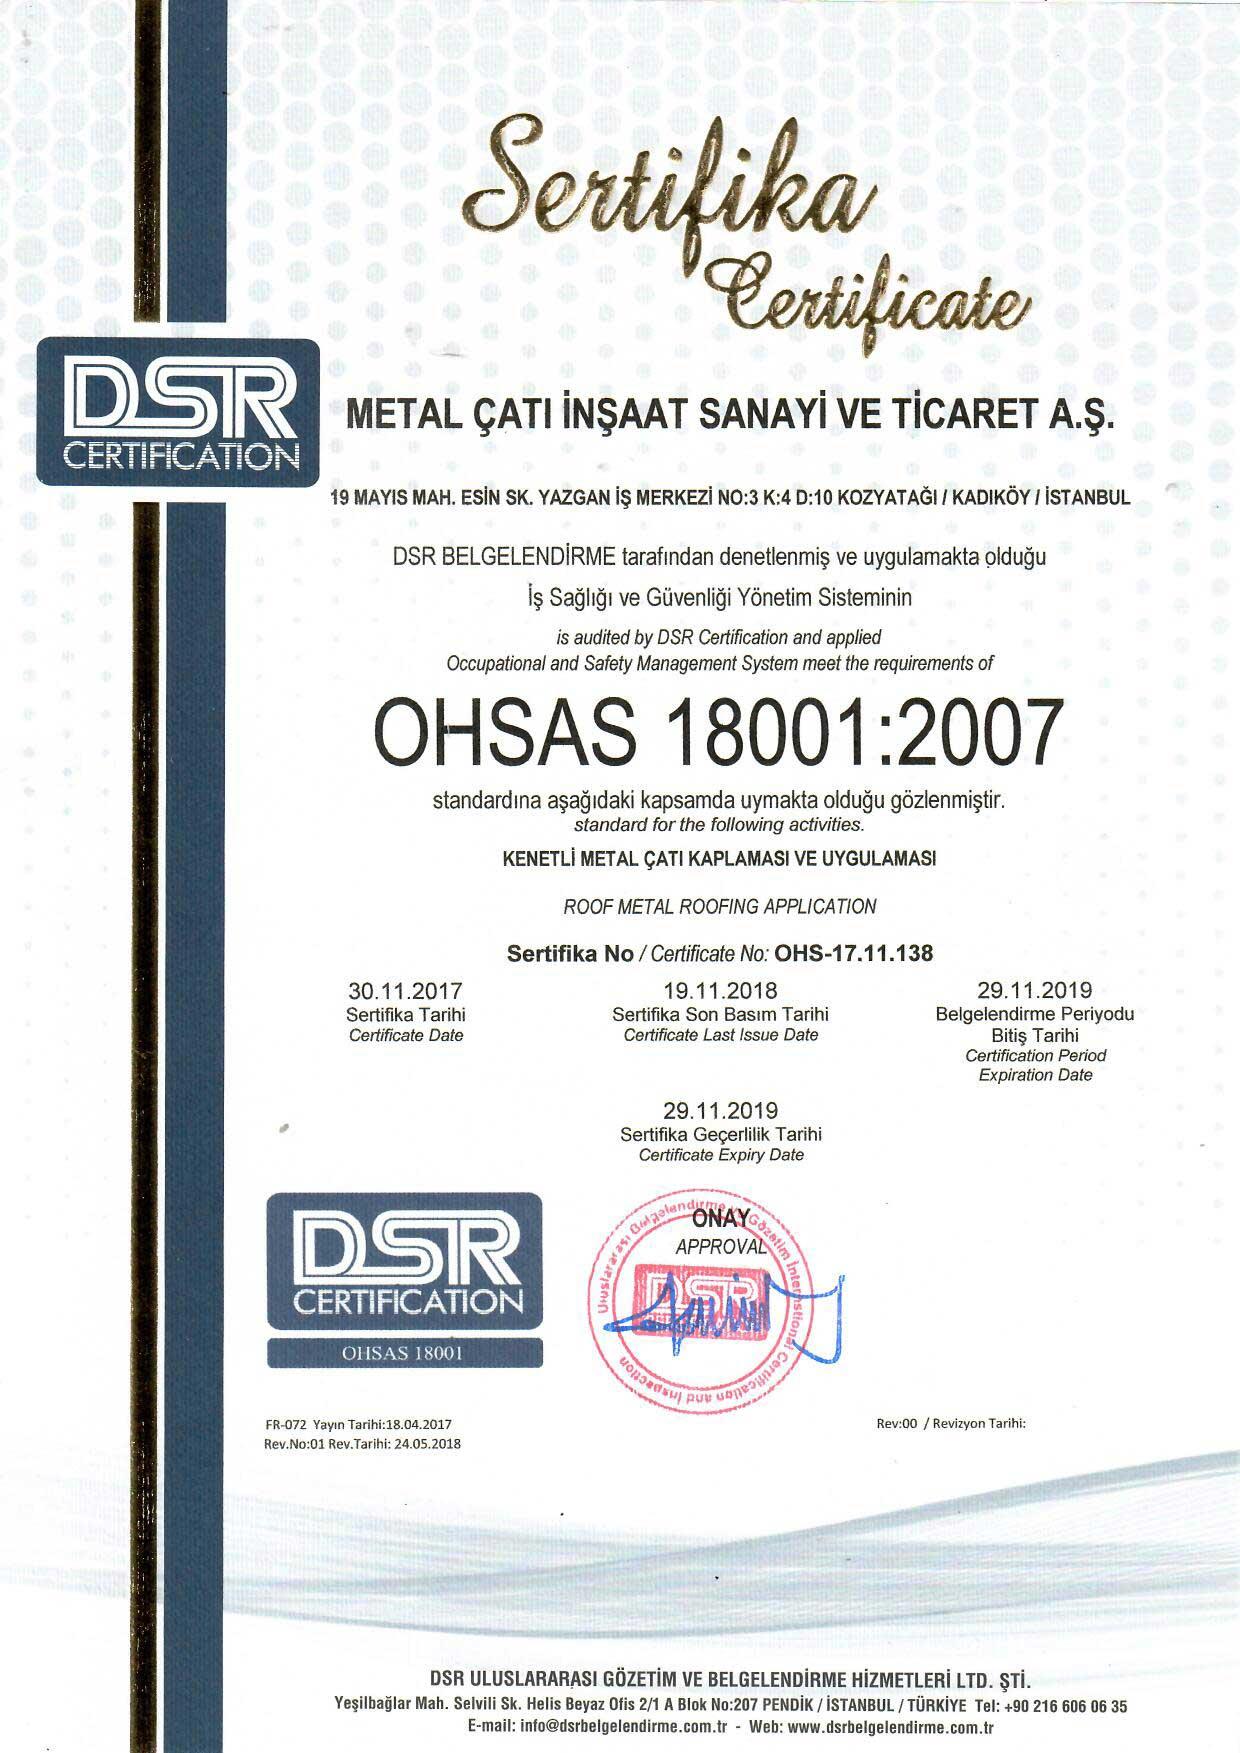 Metal Çatı - OHSAS 18001:2007